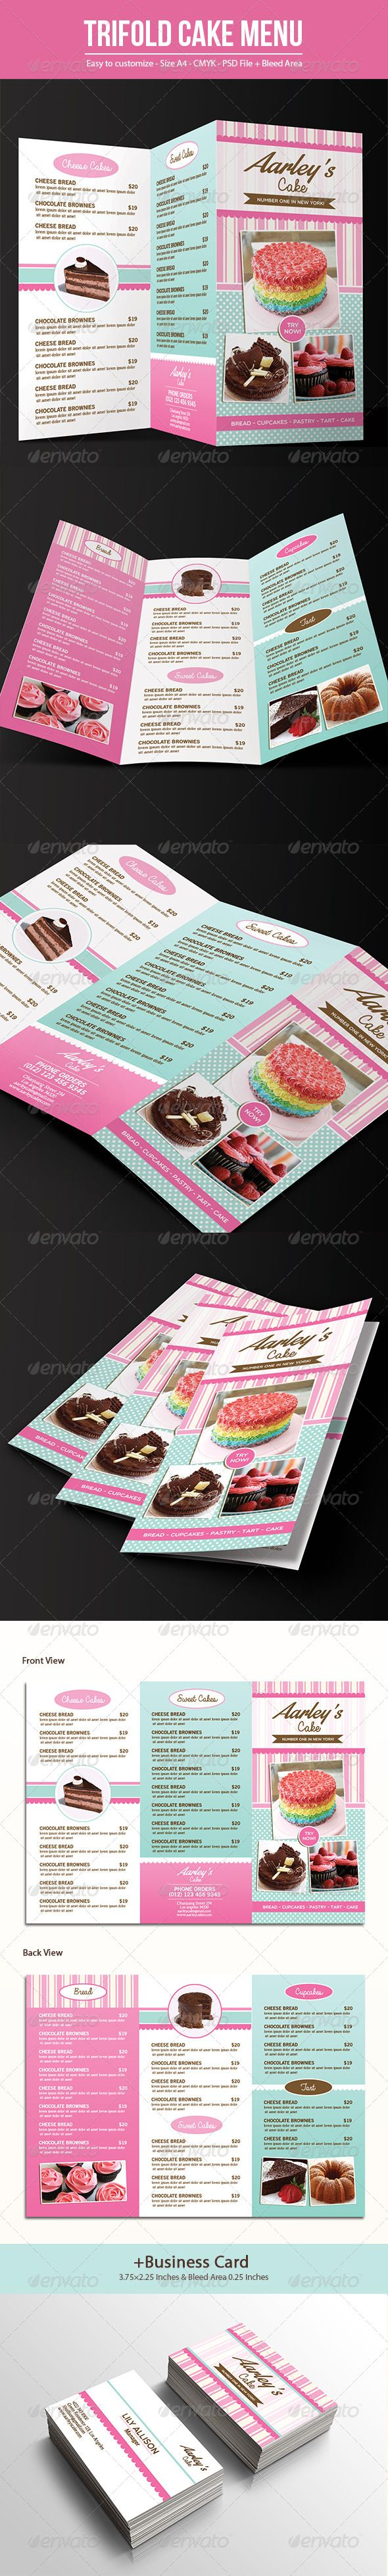 trifold cake menu business card template design speisekarte download http